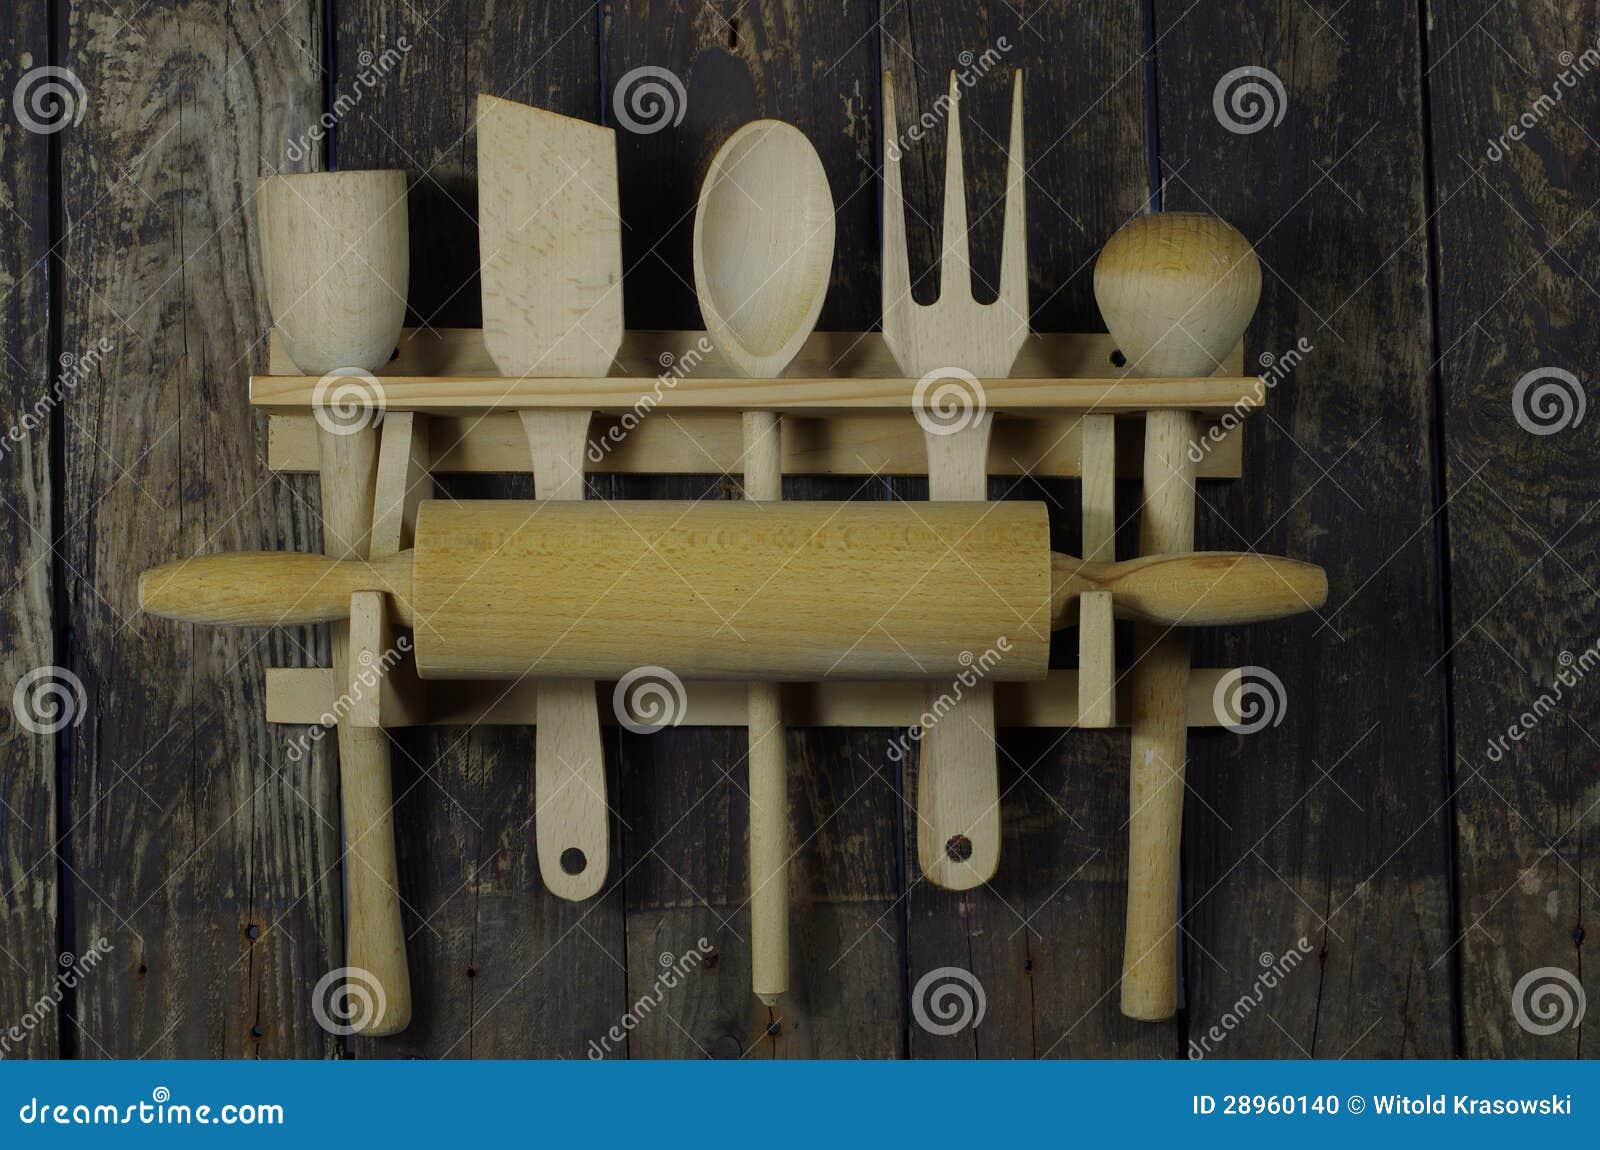 Wooden Kitchen Accessories Stock Photo - Image: 28960140